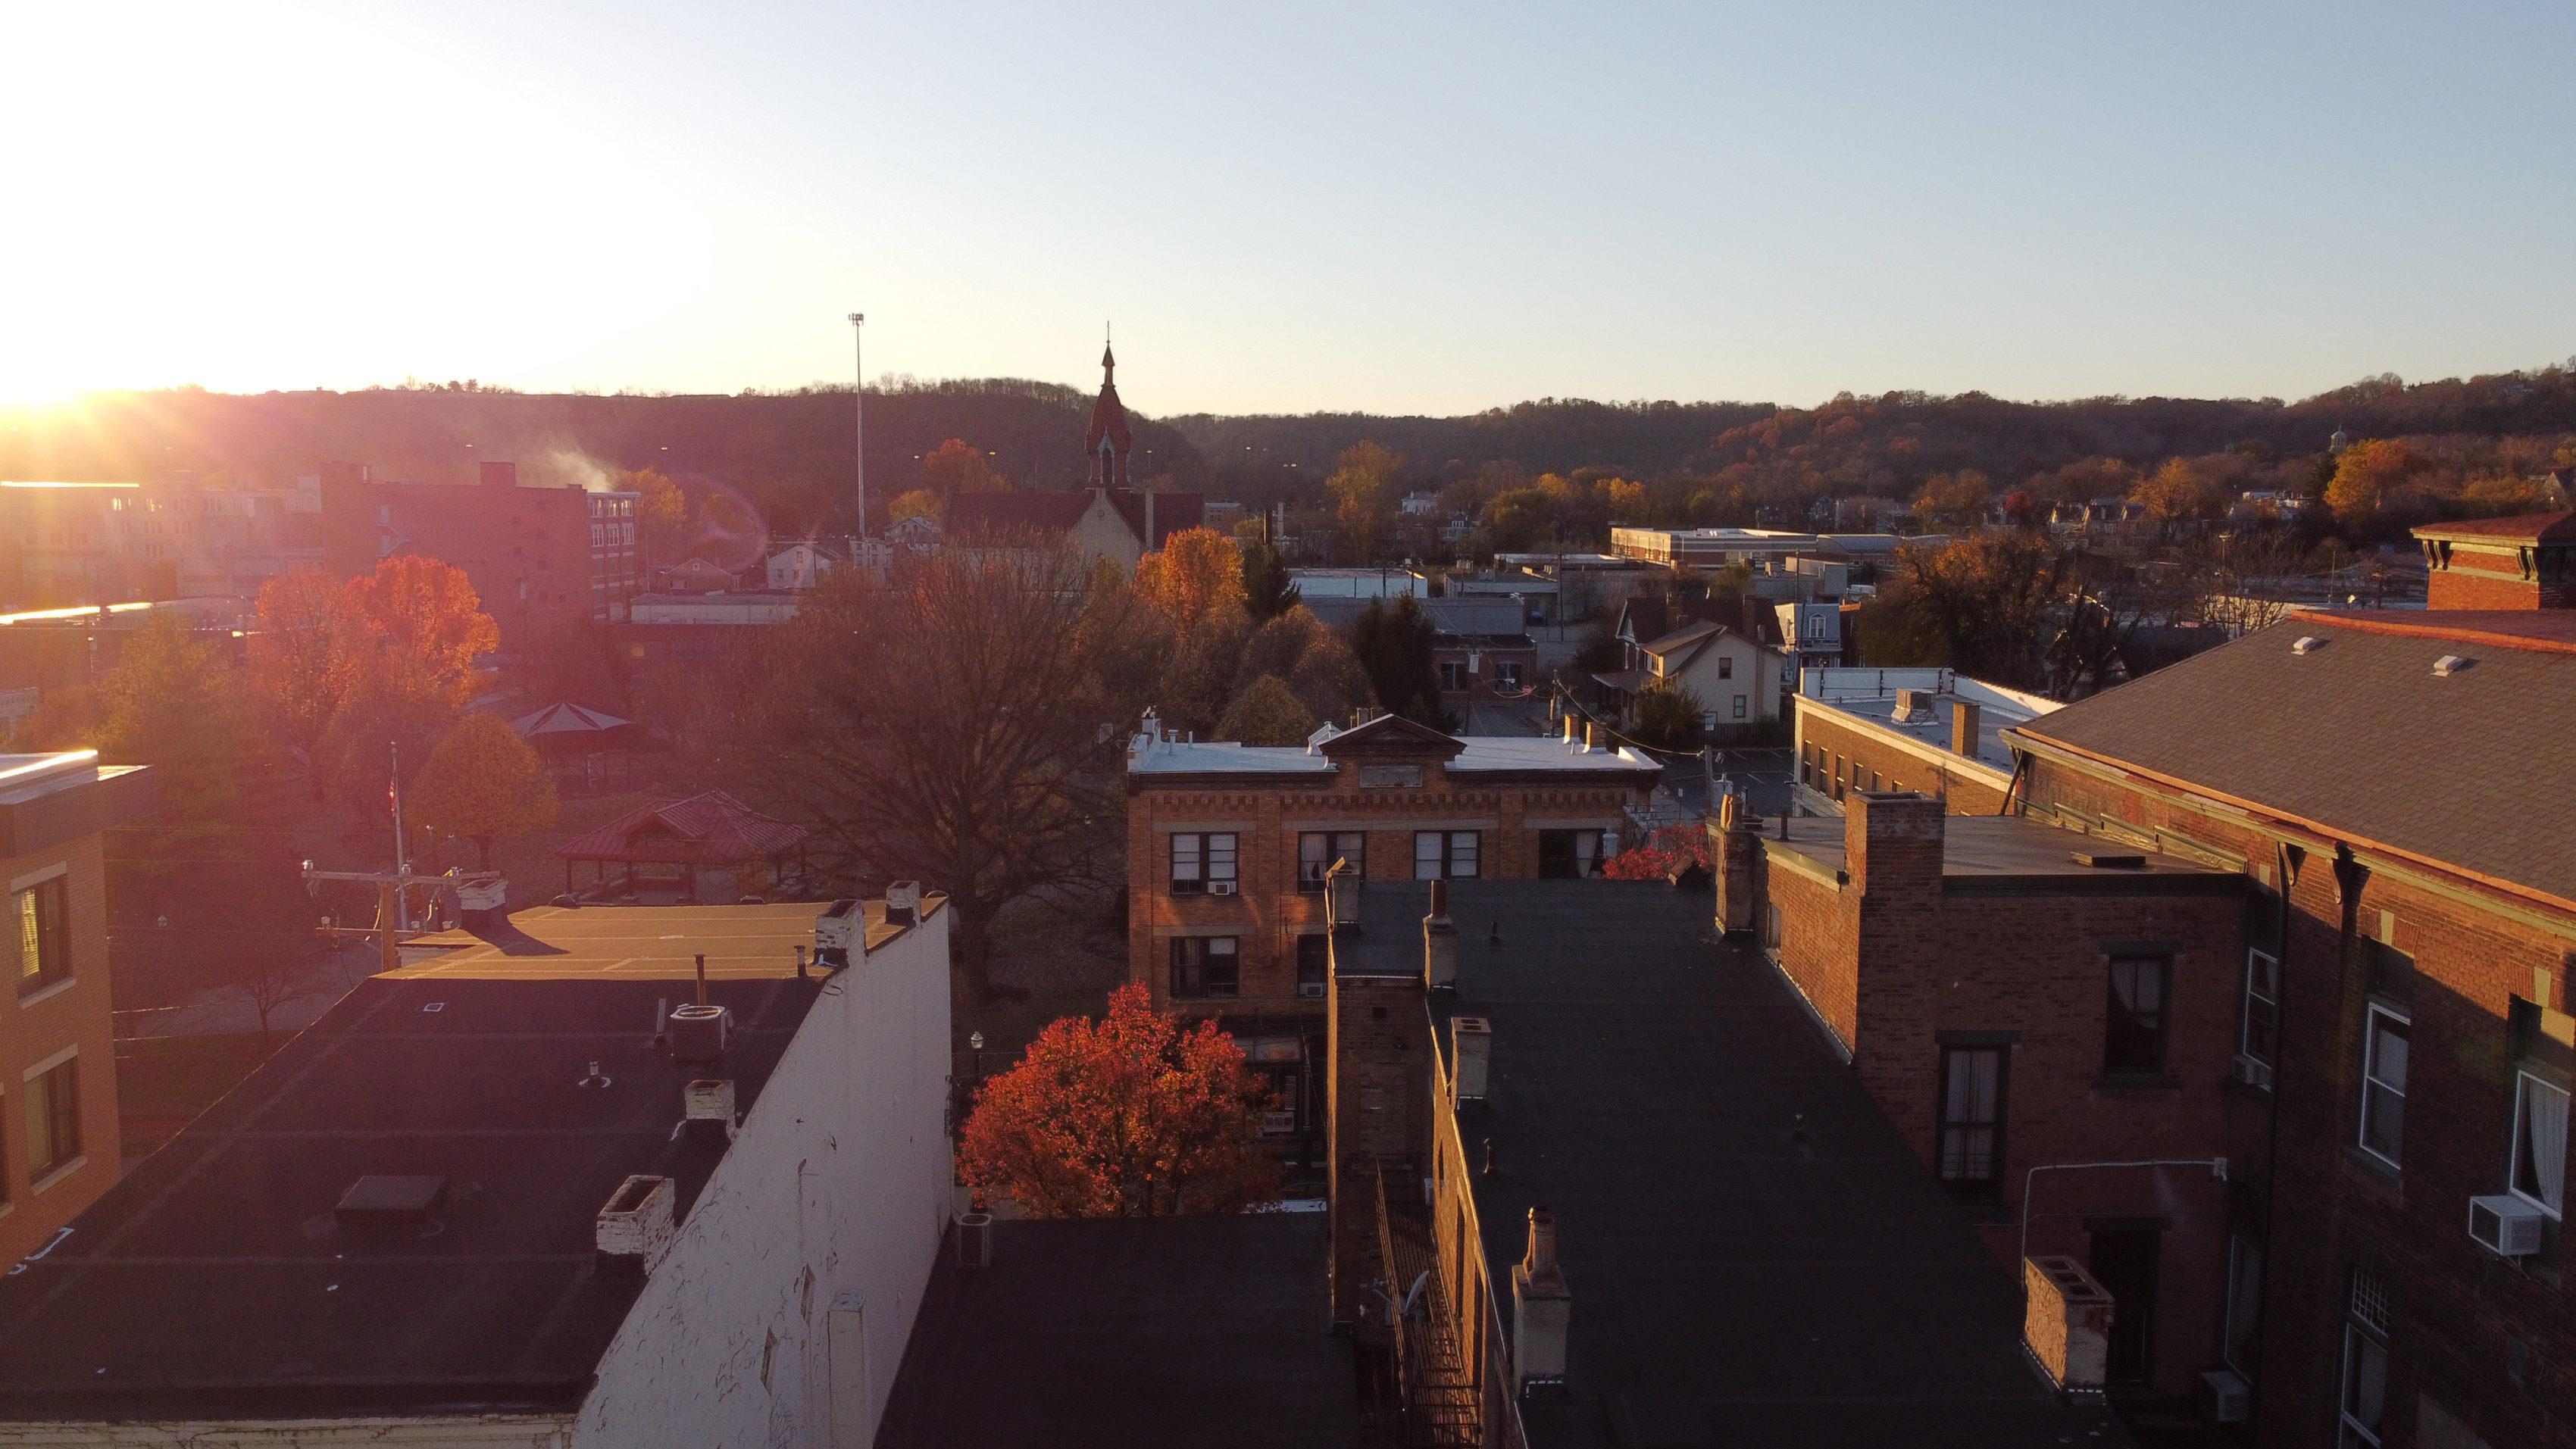 Sunset in Northside Ohio